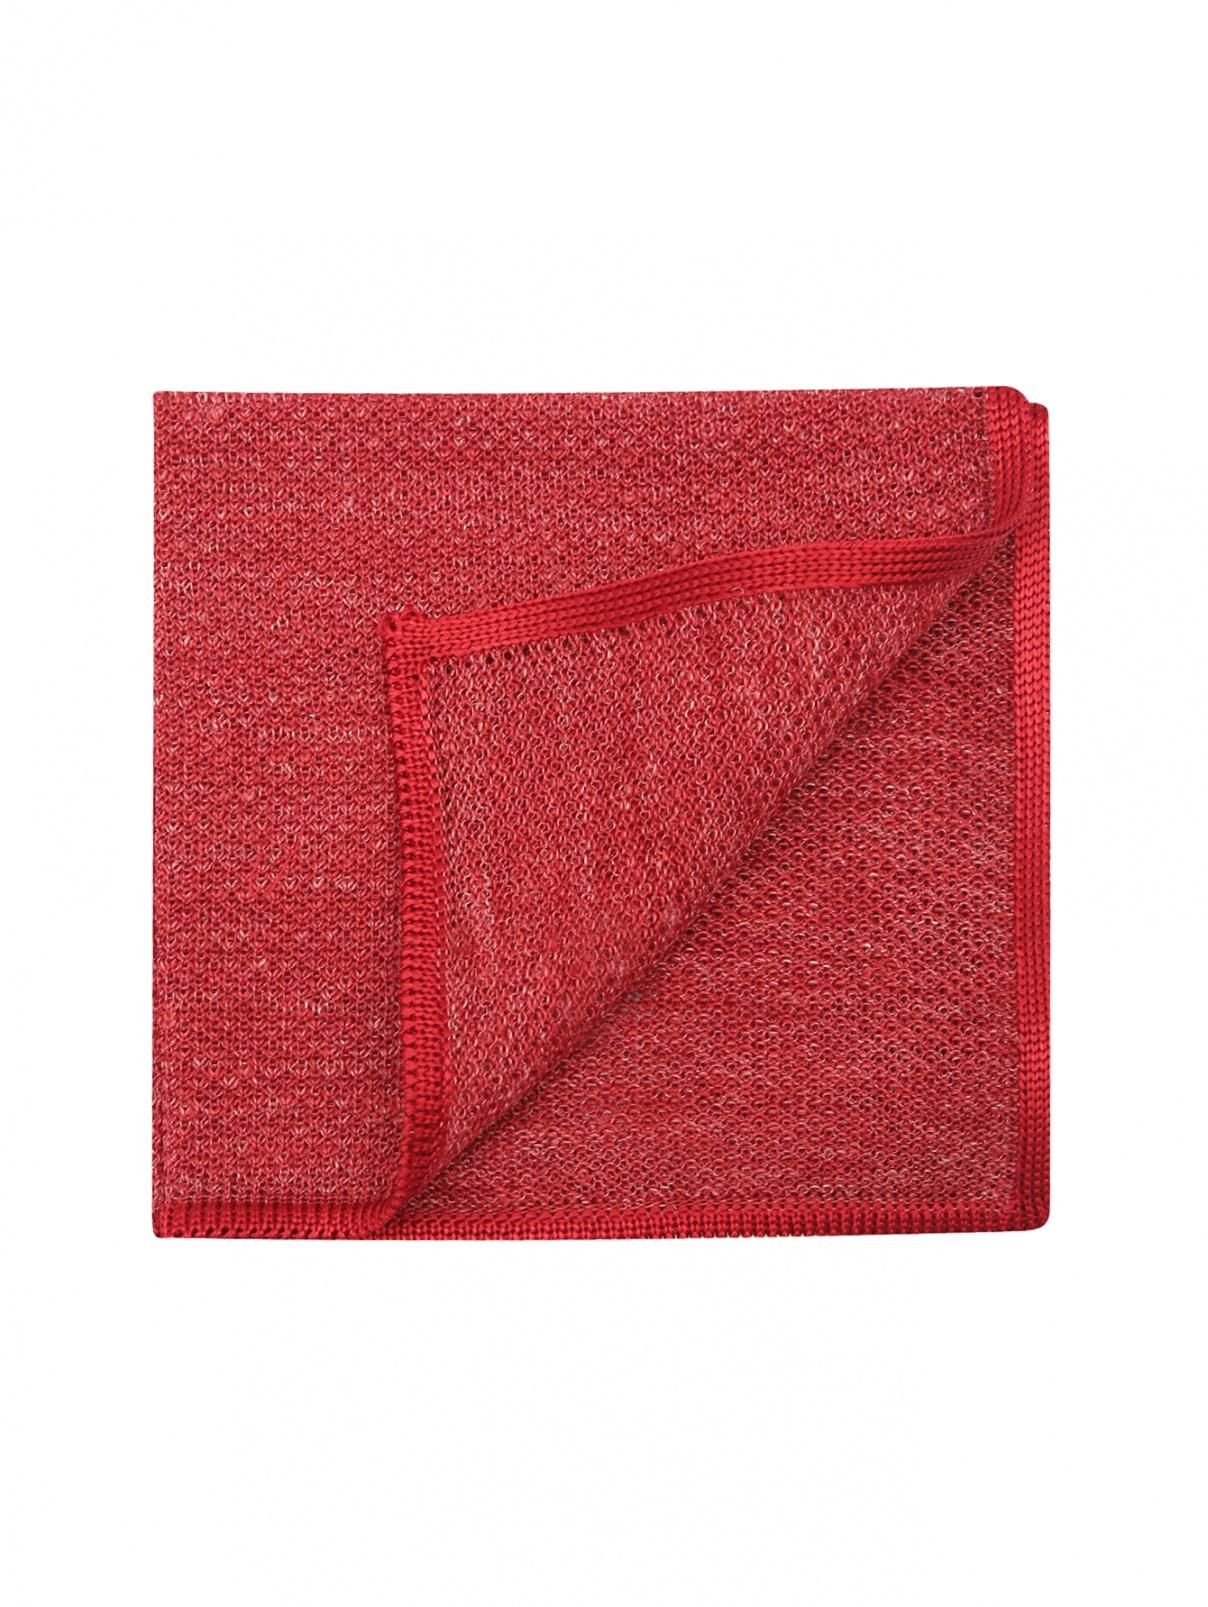 Платок из шелка и льна Eton  –  Общий вид